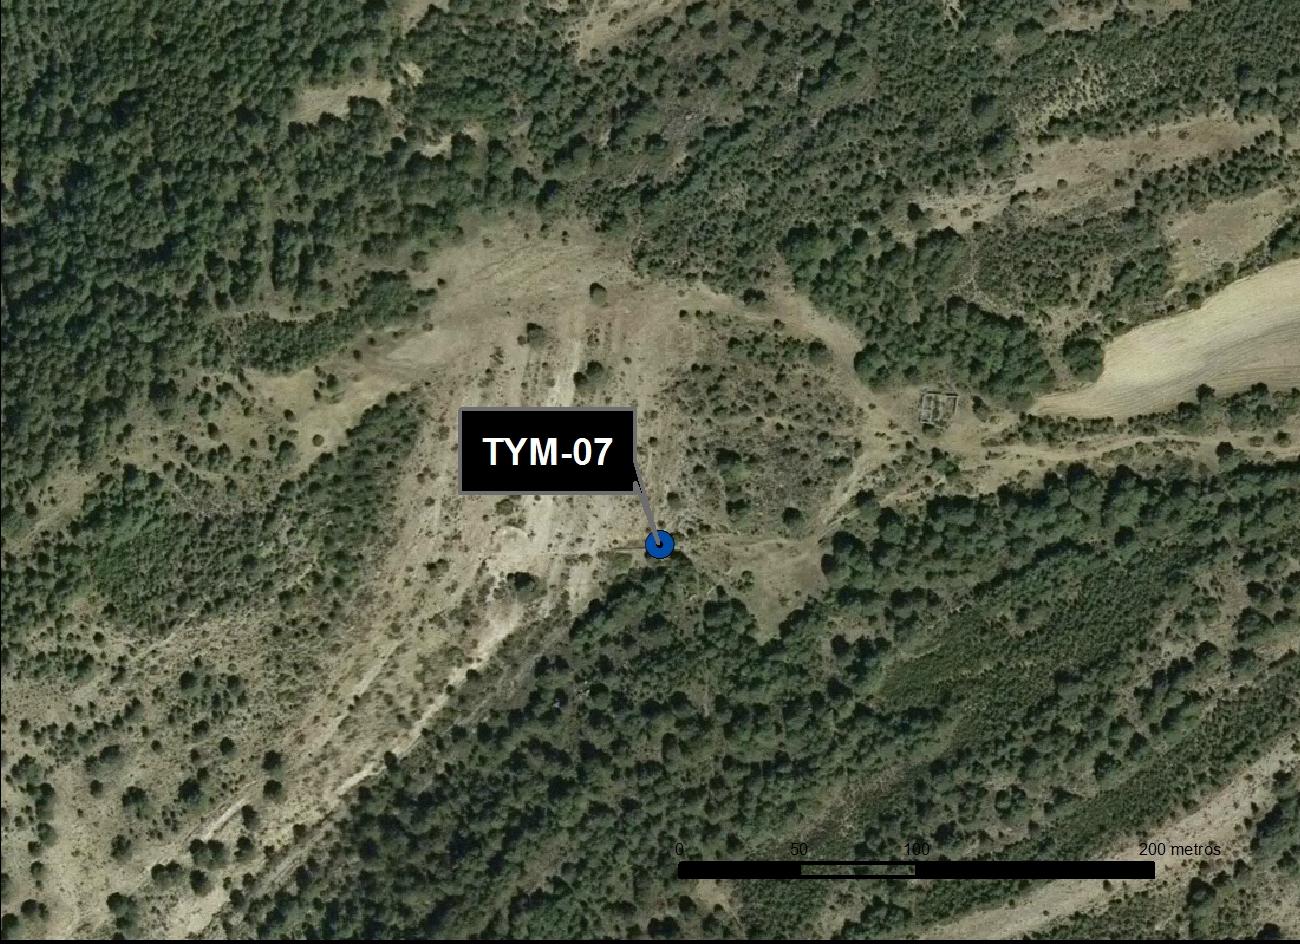 TYM_07_M.V.LOZANO_FONTARRONES I_ORTO 1